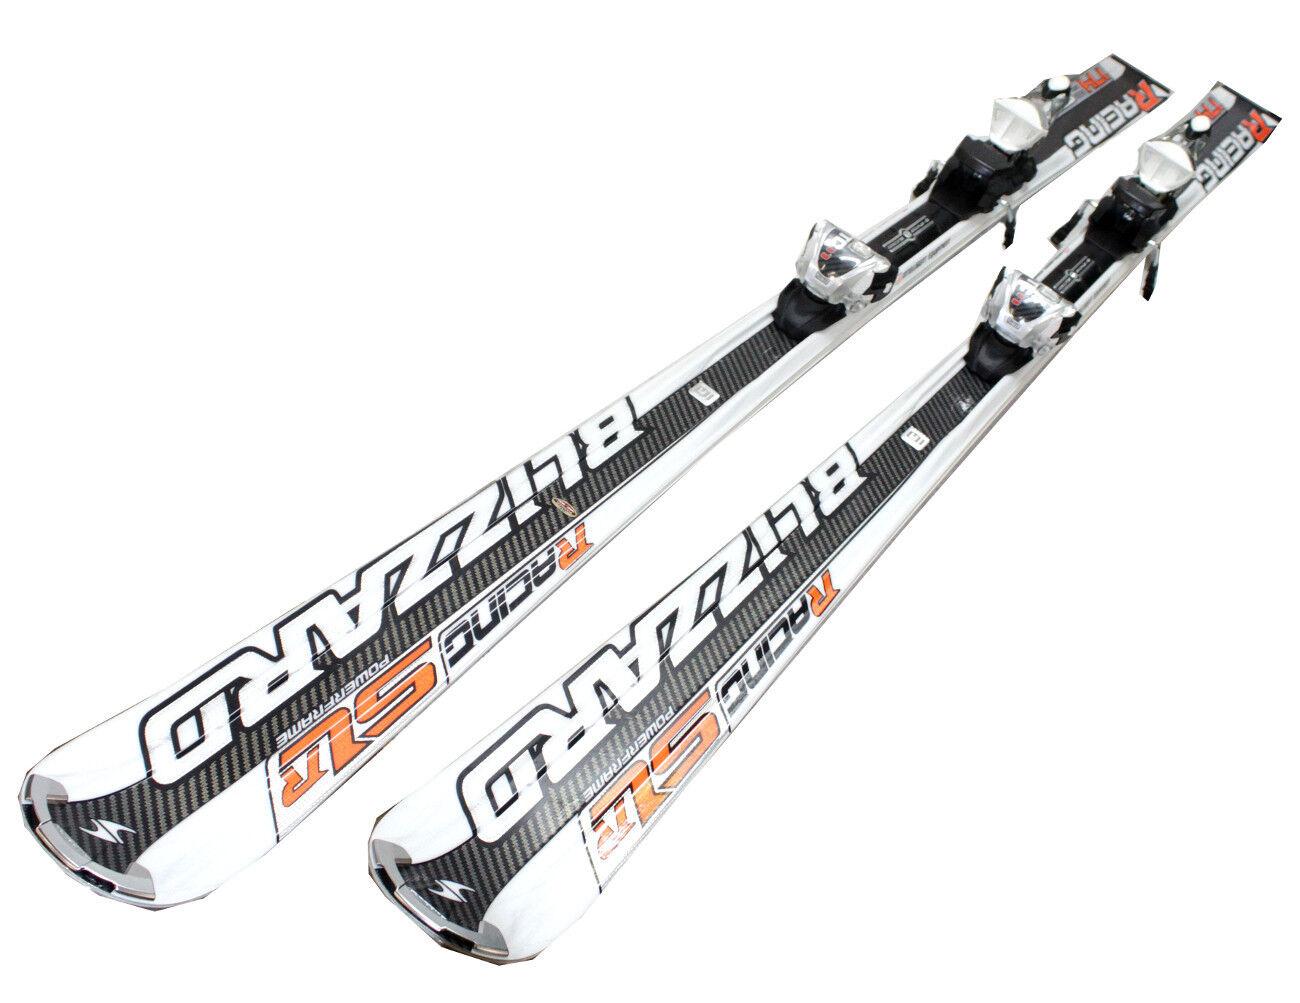 Ski Set Blizzard SLR Magnesium Slalom Test  Racecarver 68 1 2in + Binding Marker  sale online discount